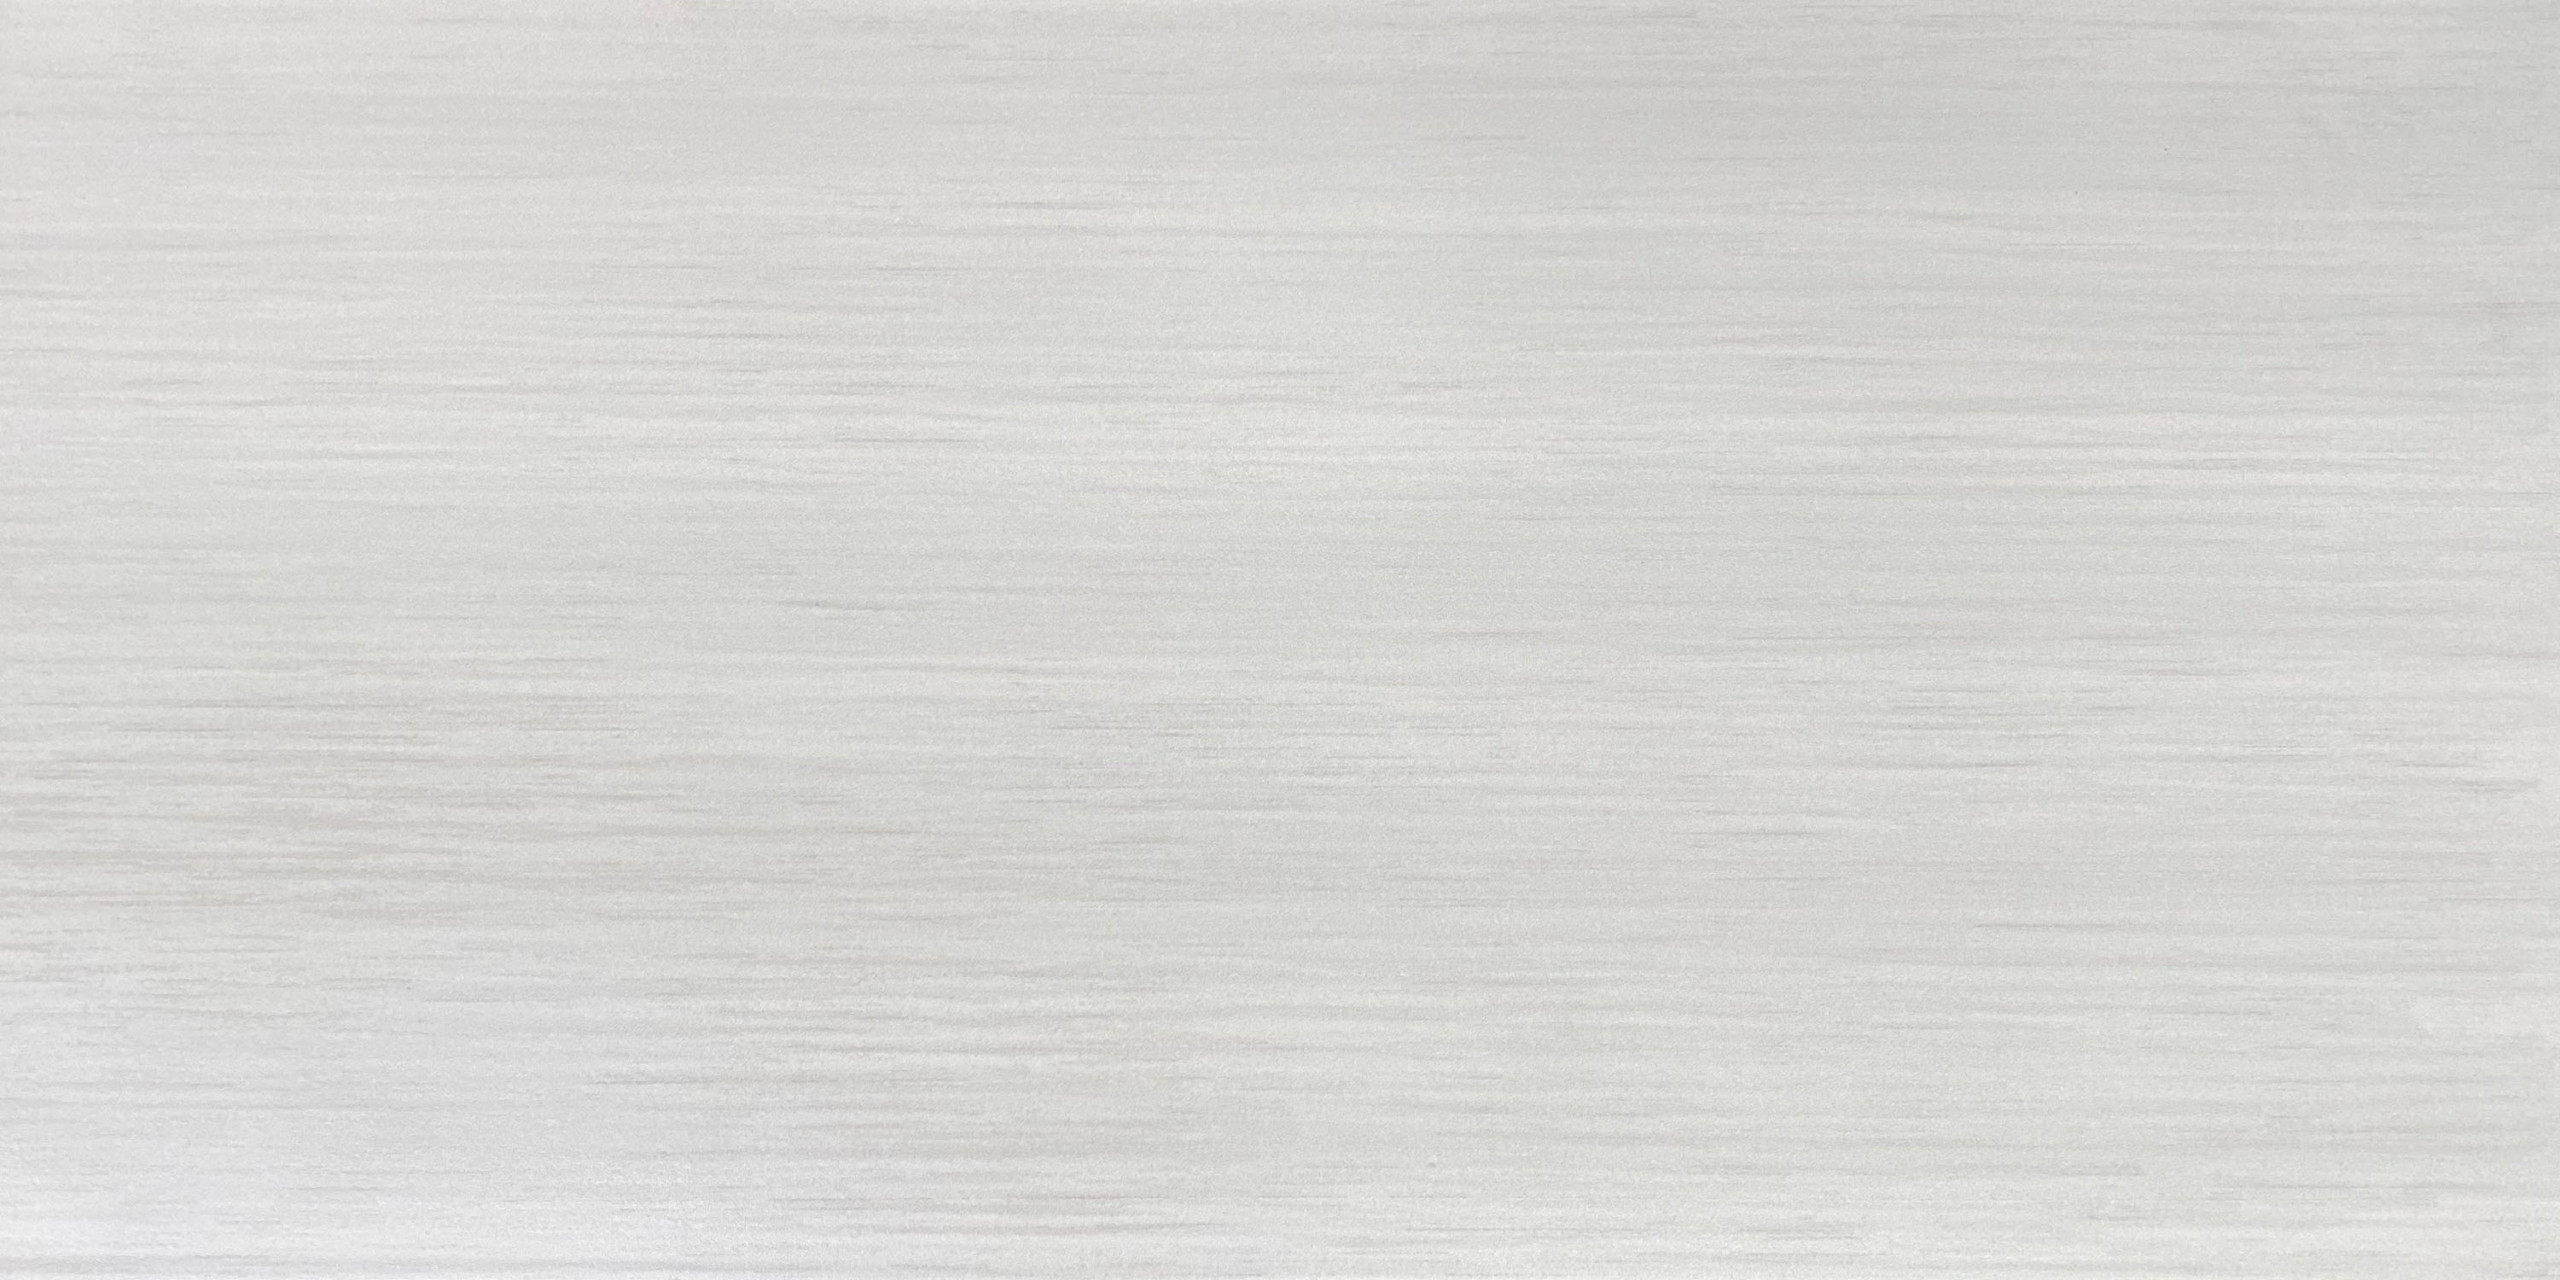 MELT grau Image